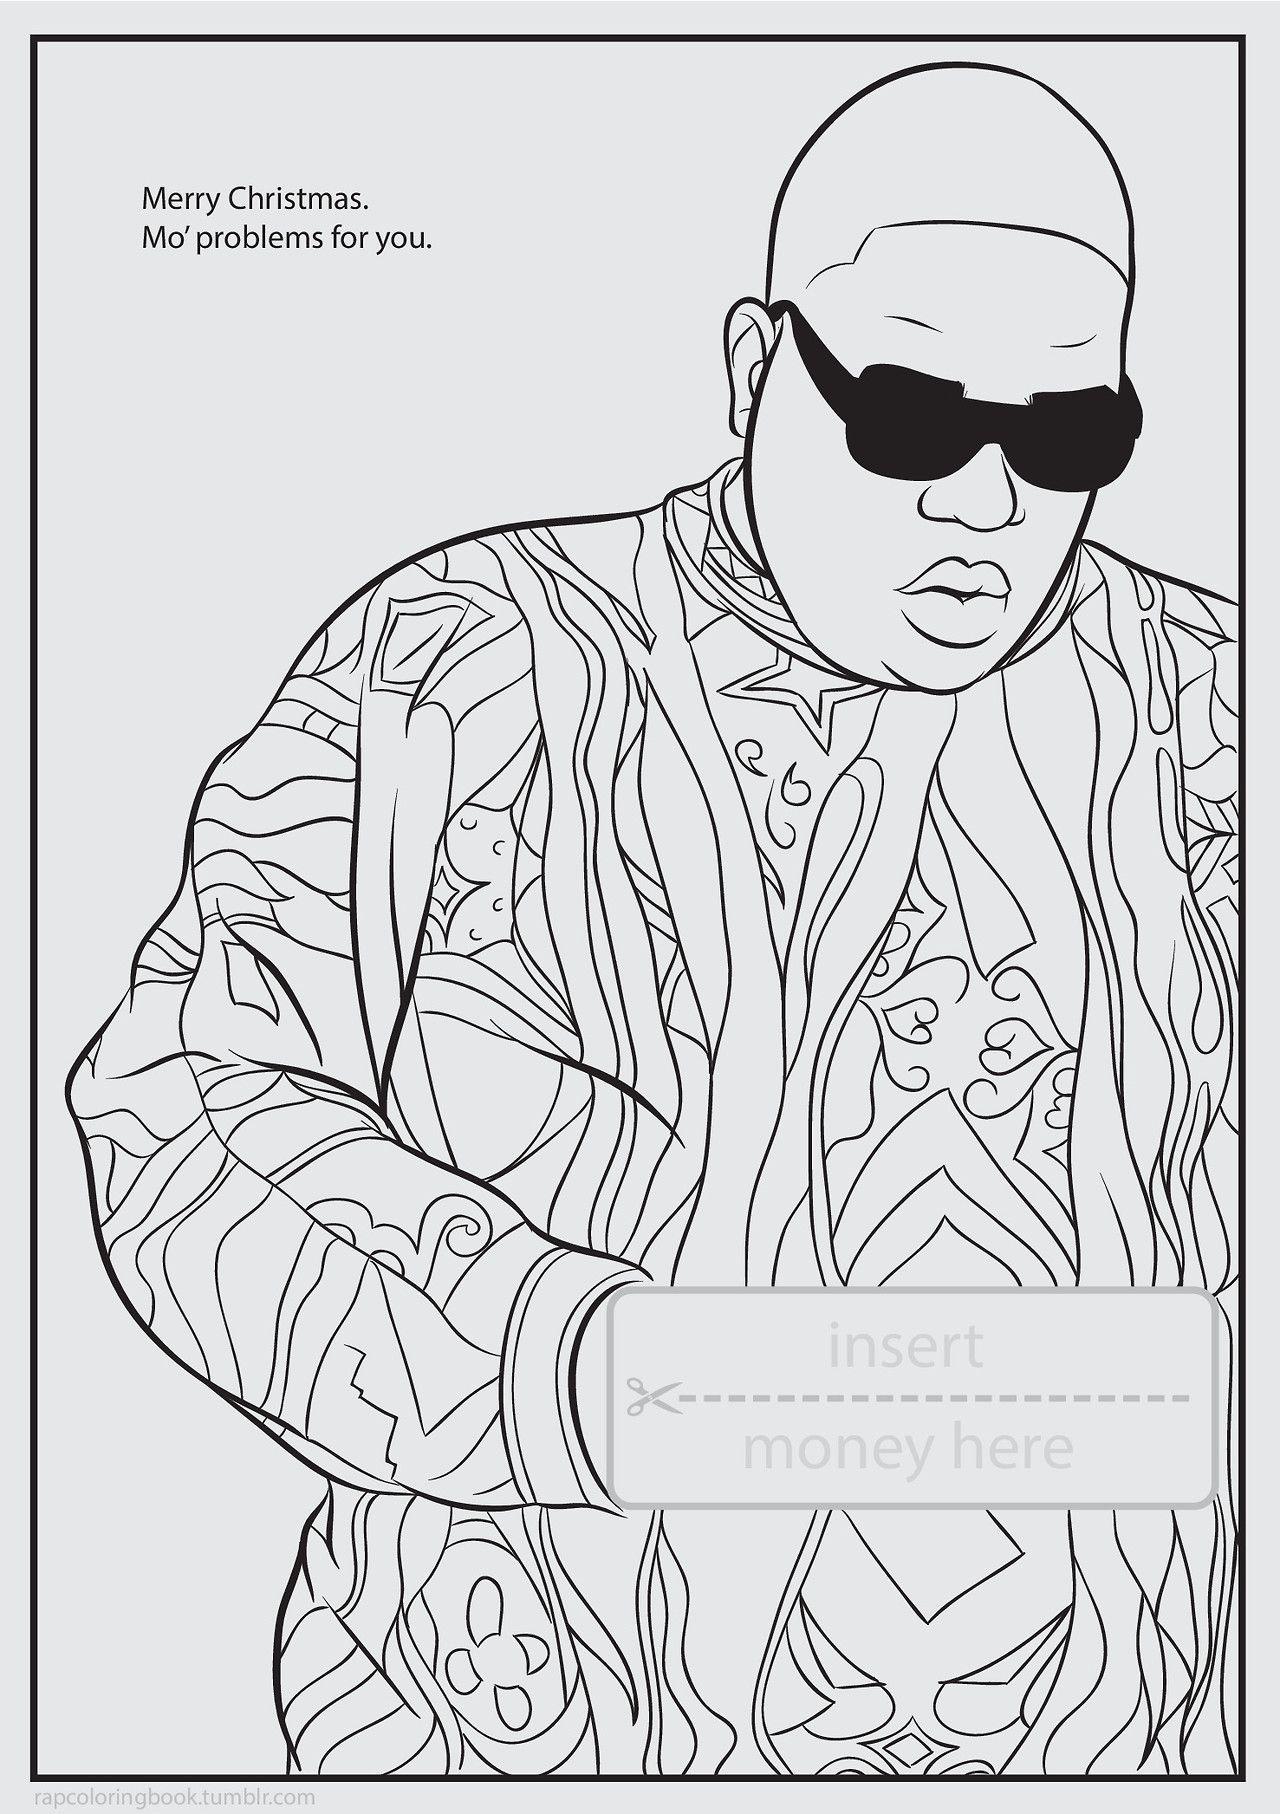 Bun B S Rap Coloring And Activity Book Coloring Books Coloring Pages Coloring Book Pages